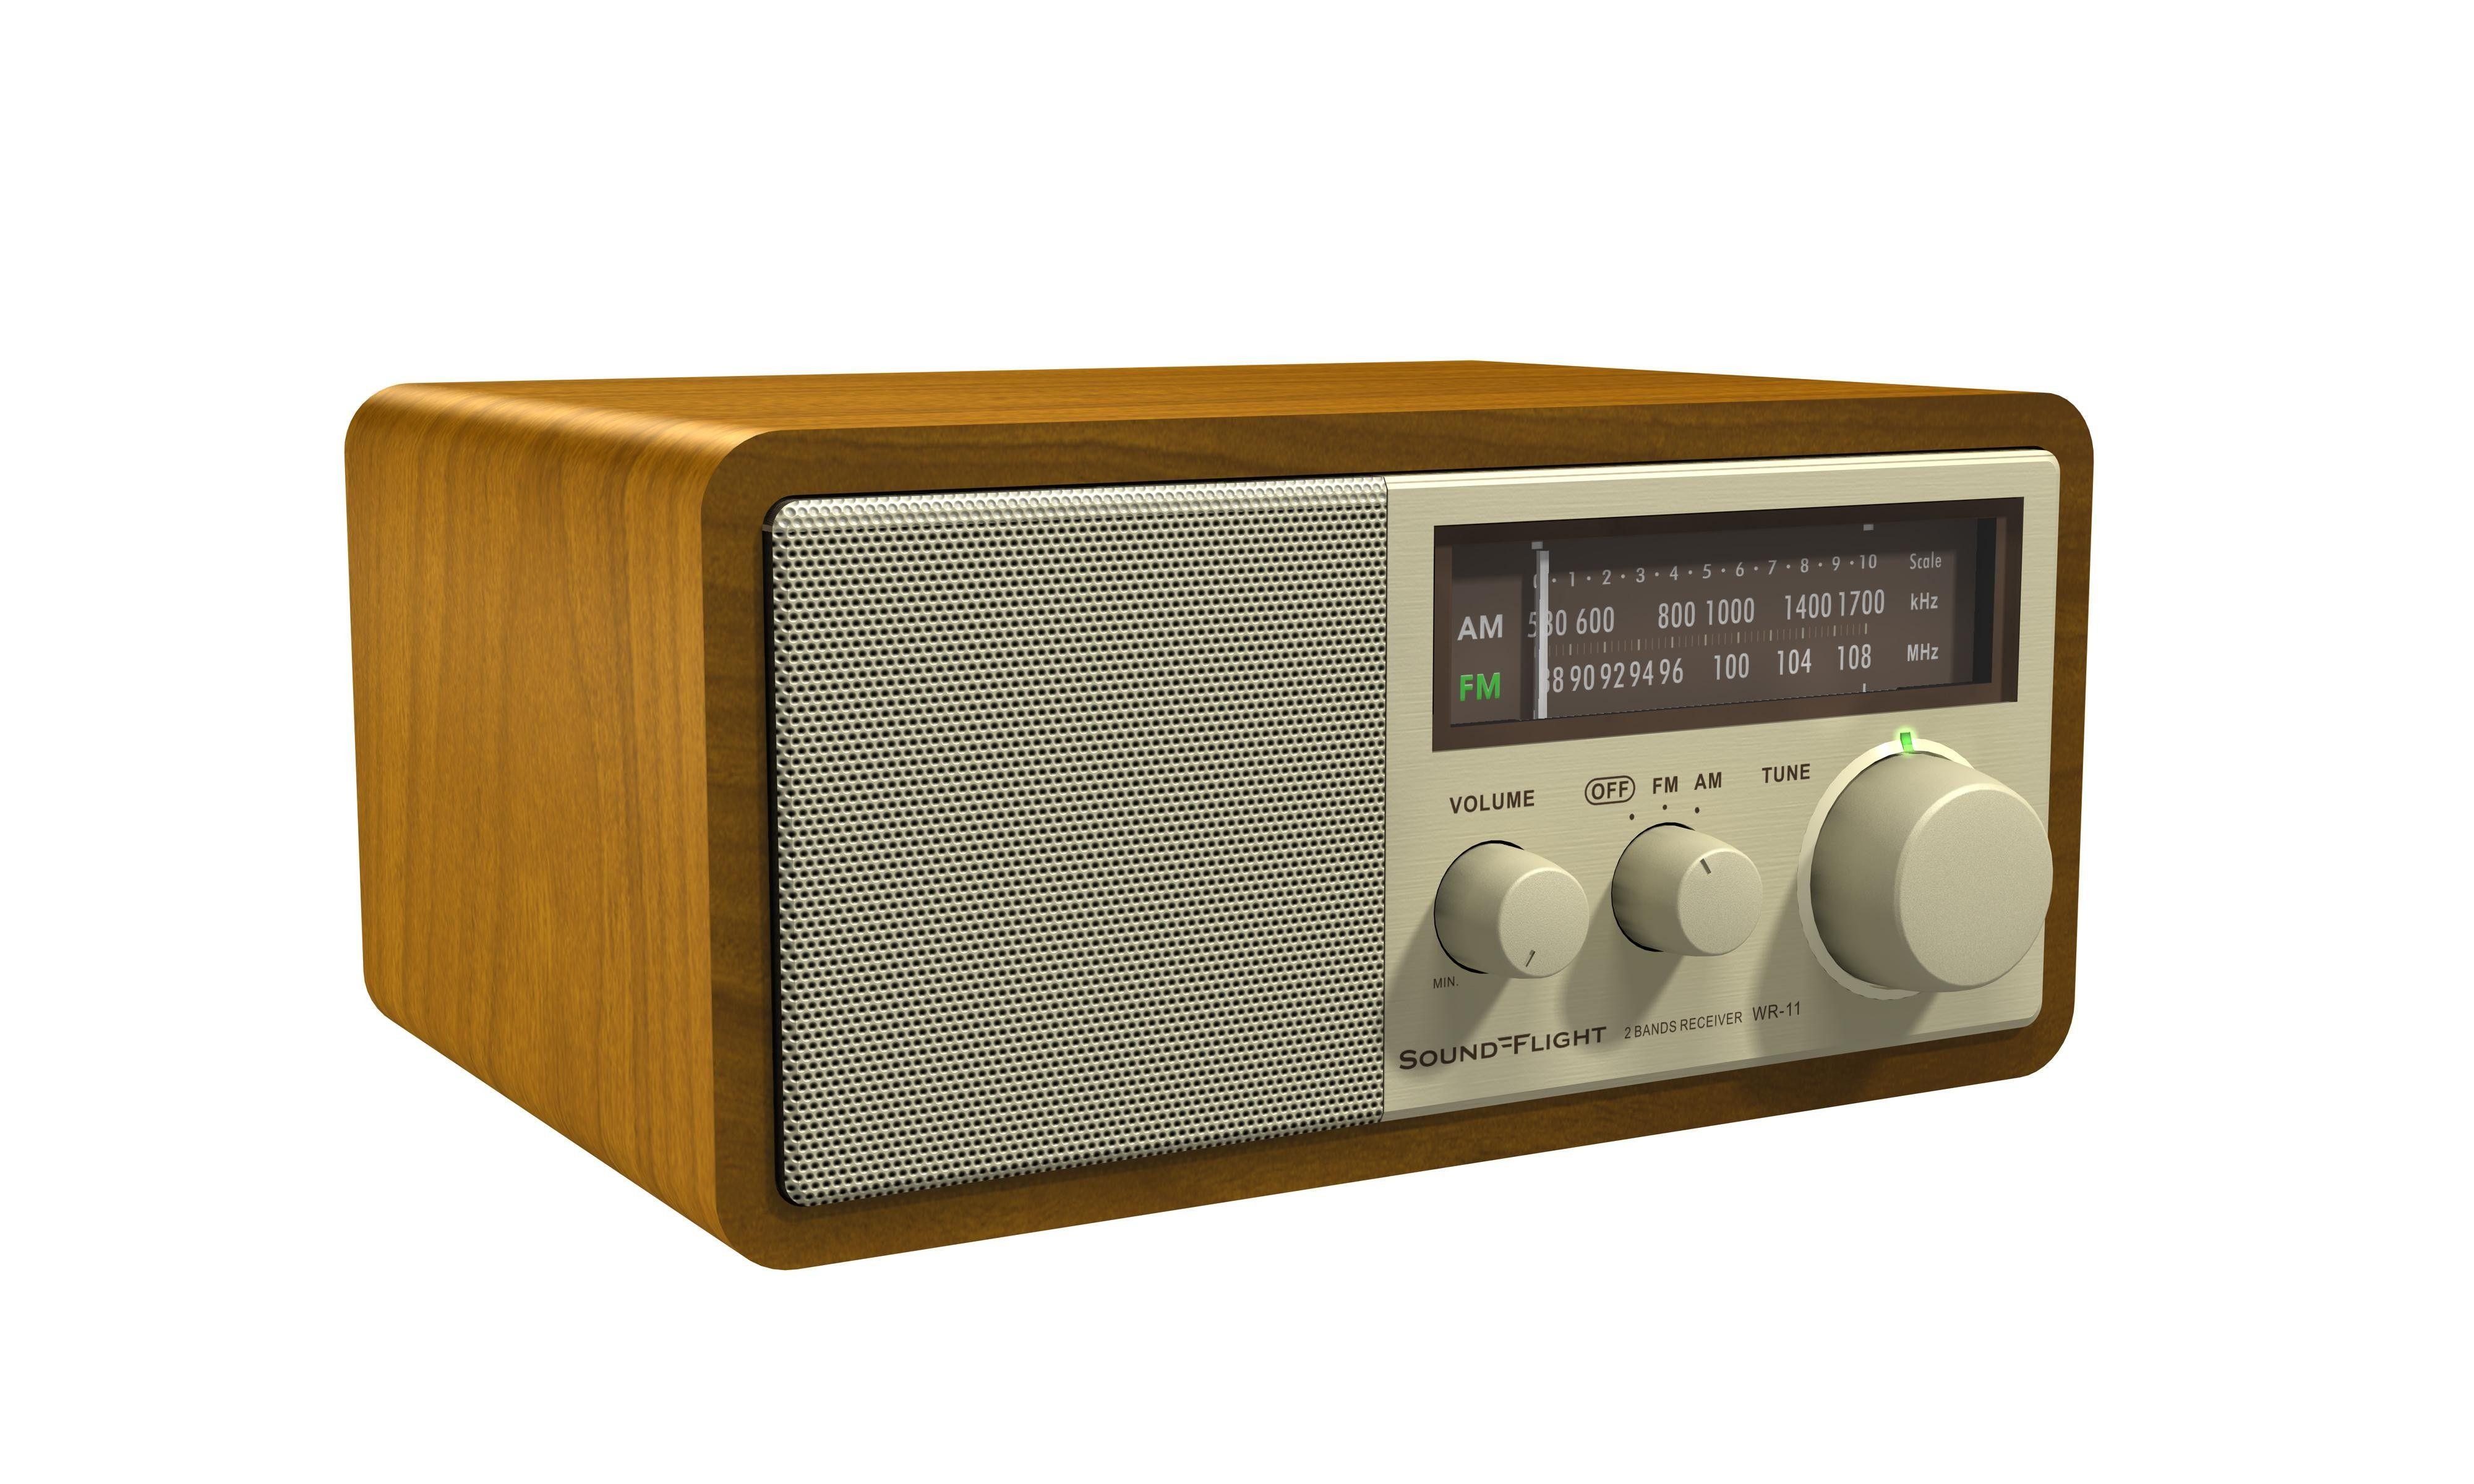 Retro Radio - SOUNDFLIGHT RESWR-11 Radio | Cool Gifts For